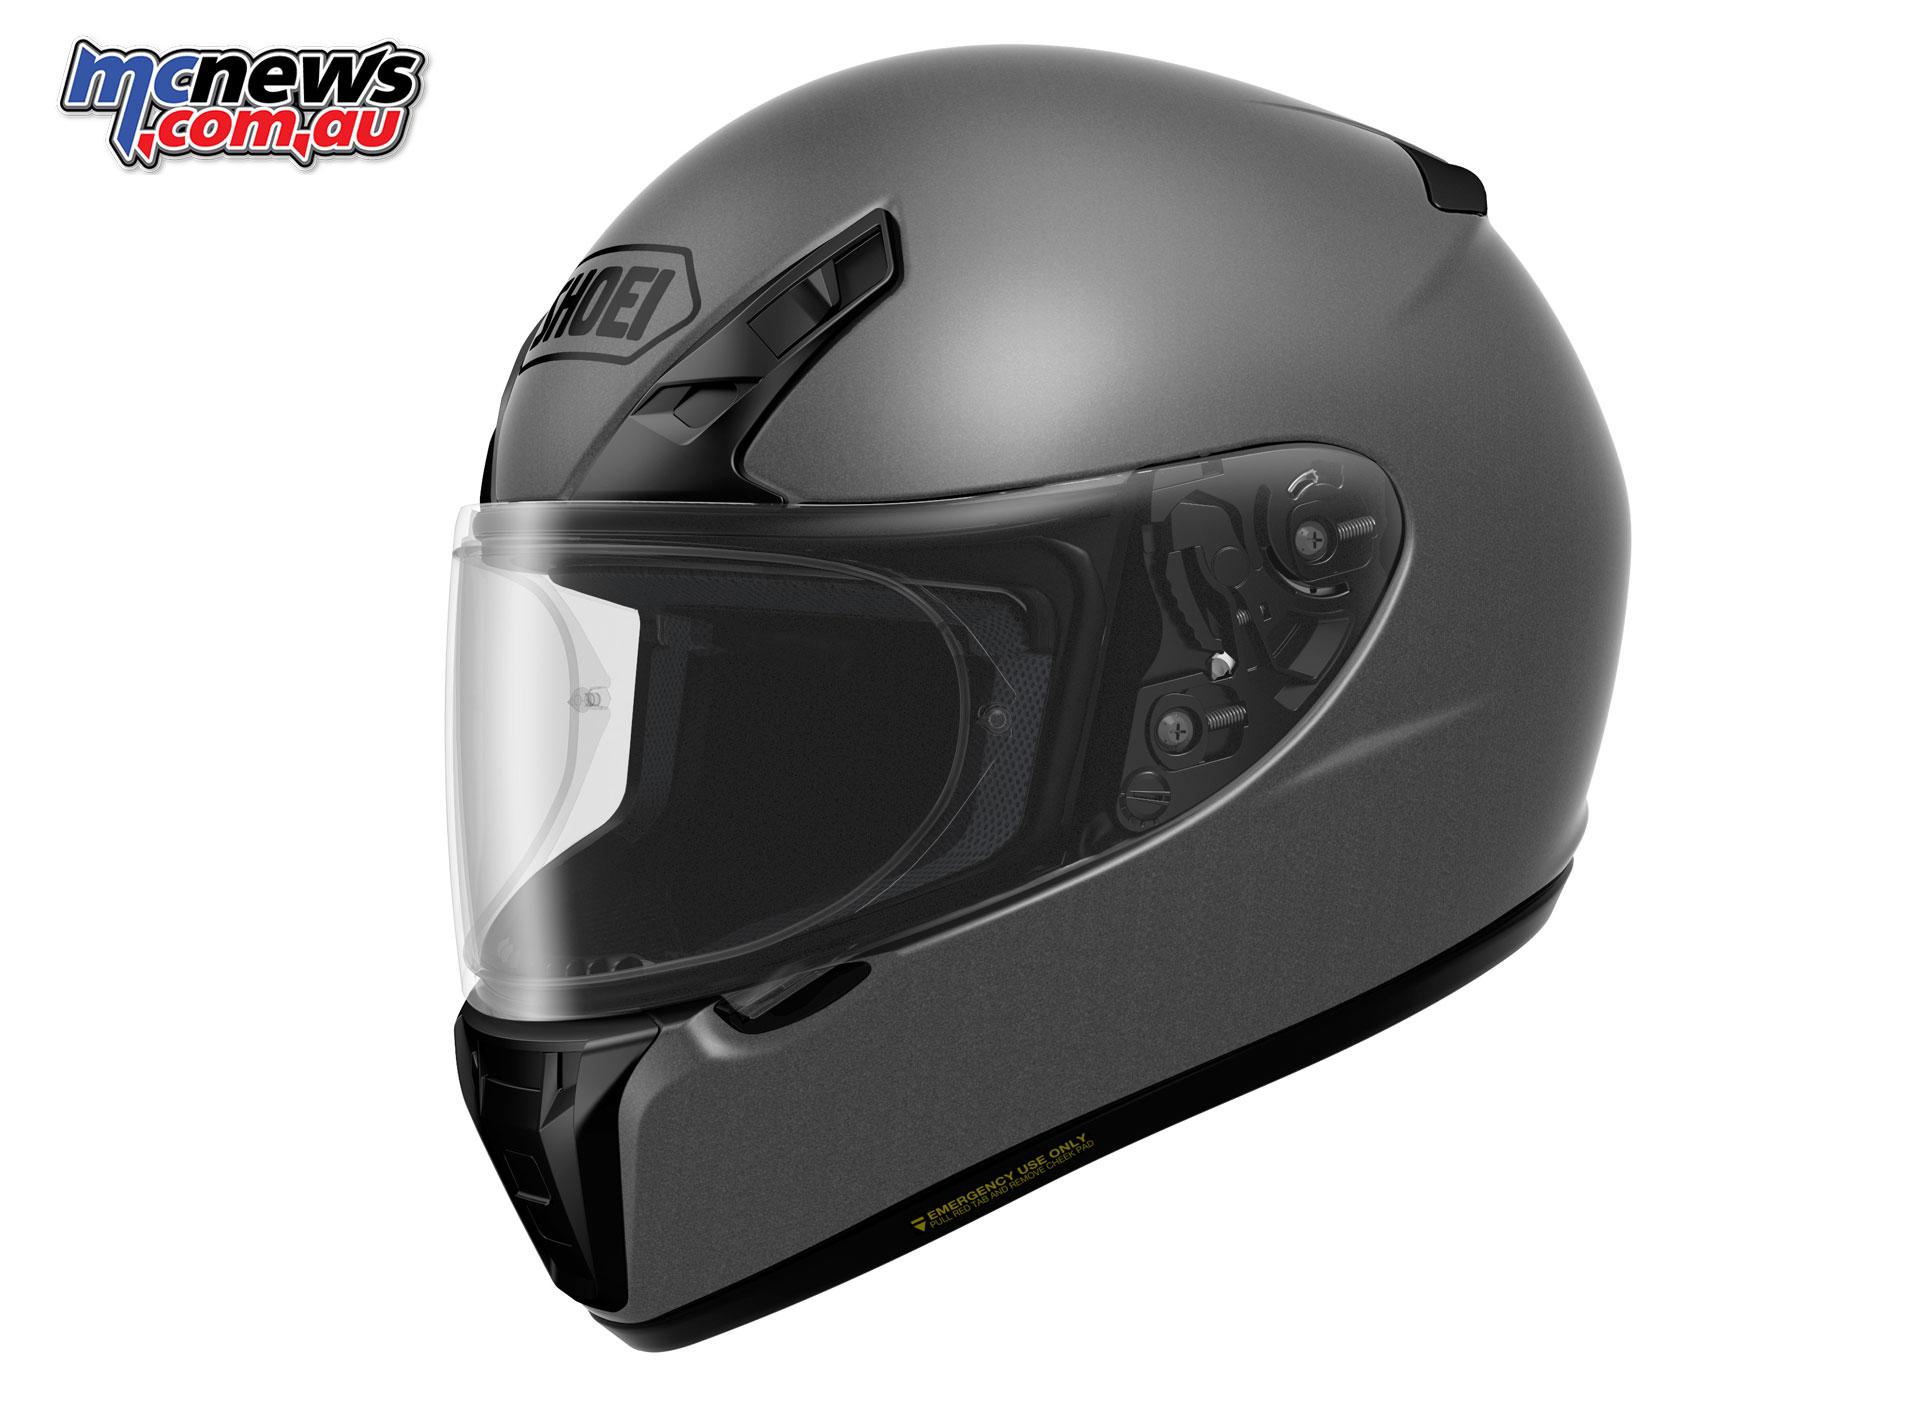 Shoei Unveil All New Ryd Helmet Arriving April Mcnews